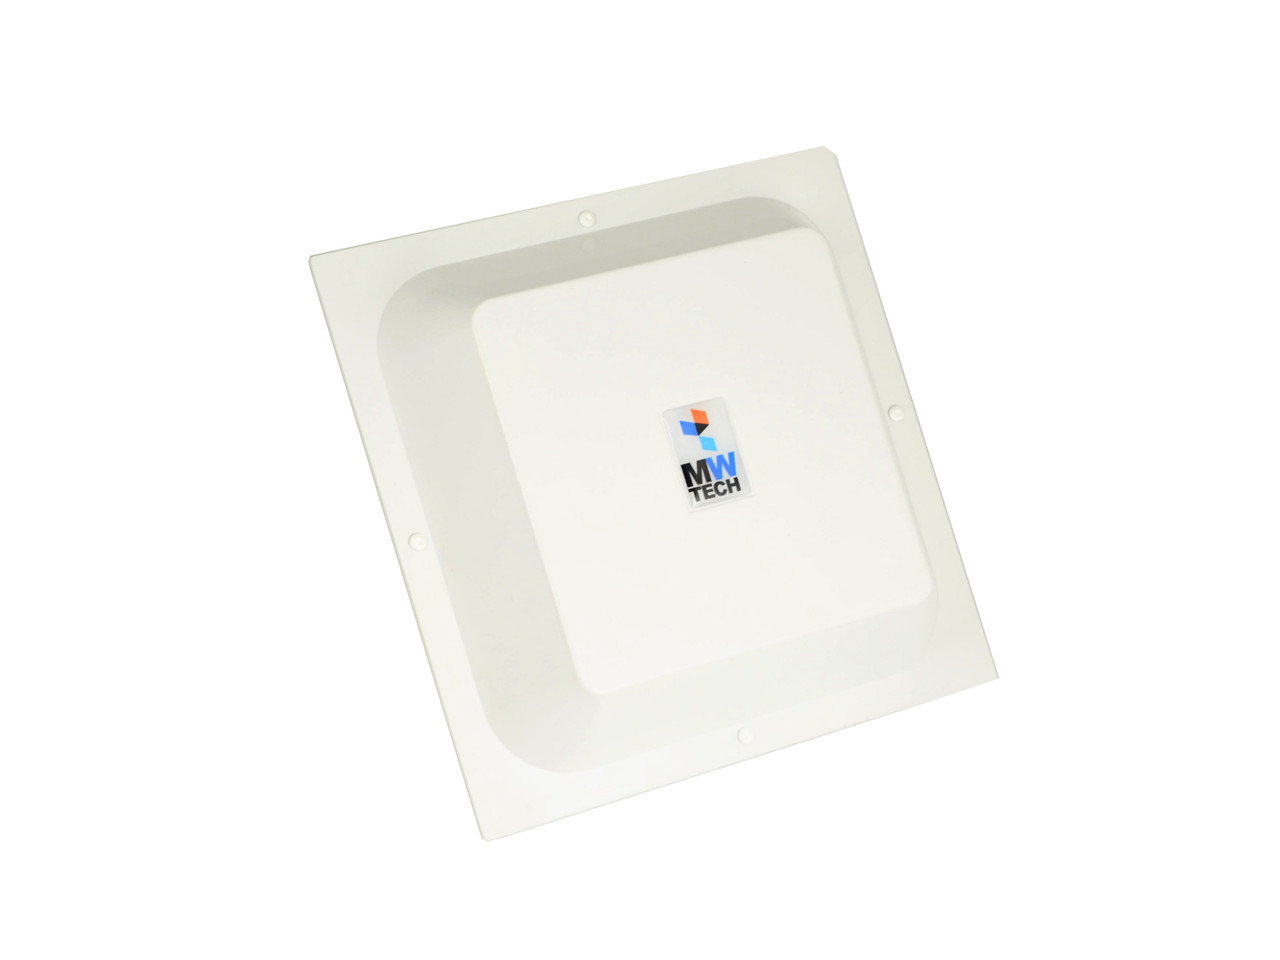 4G LTE антенна квадрат MIMO панельная RNet 1700-2700 МГц 15 дБ (Lifecell, Vodafone, Lifecell), фото 2